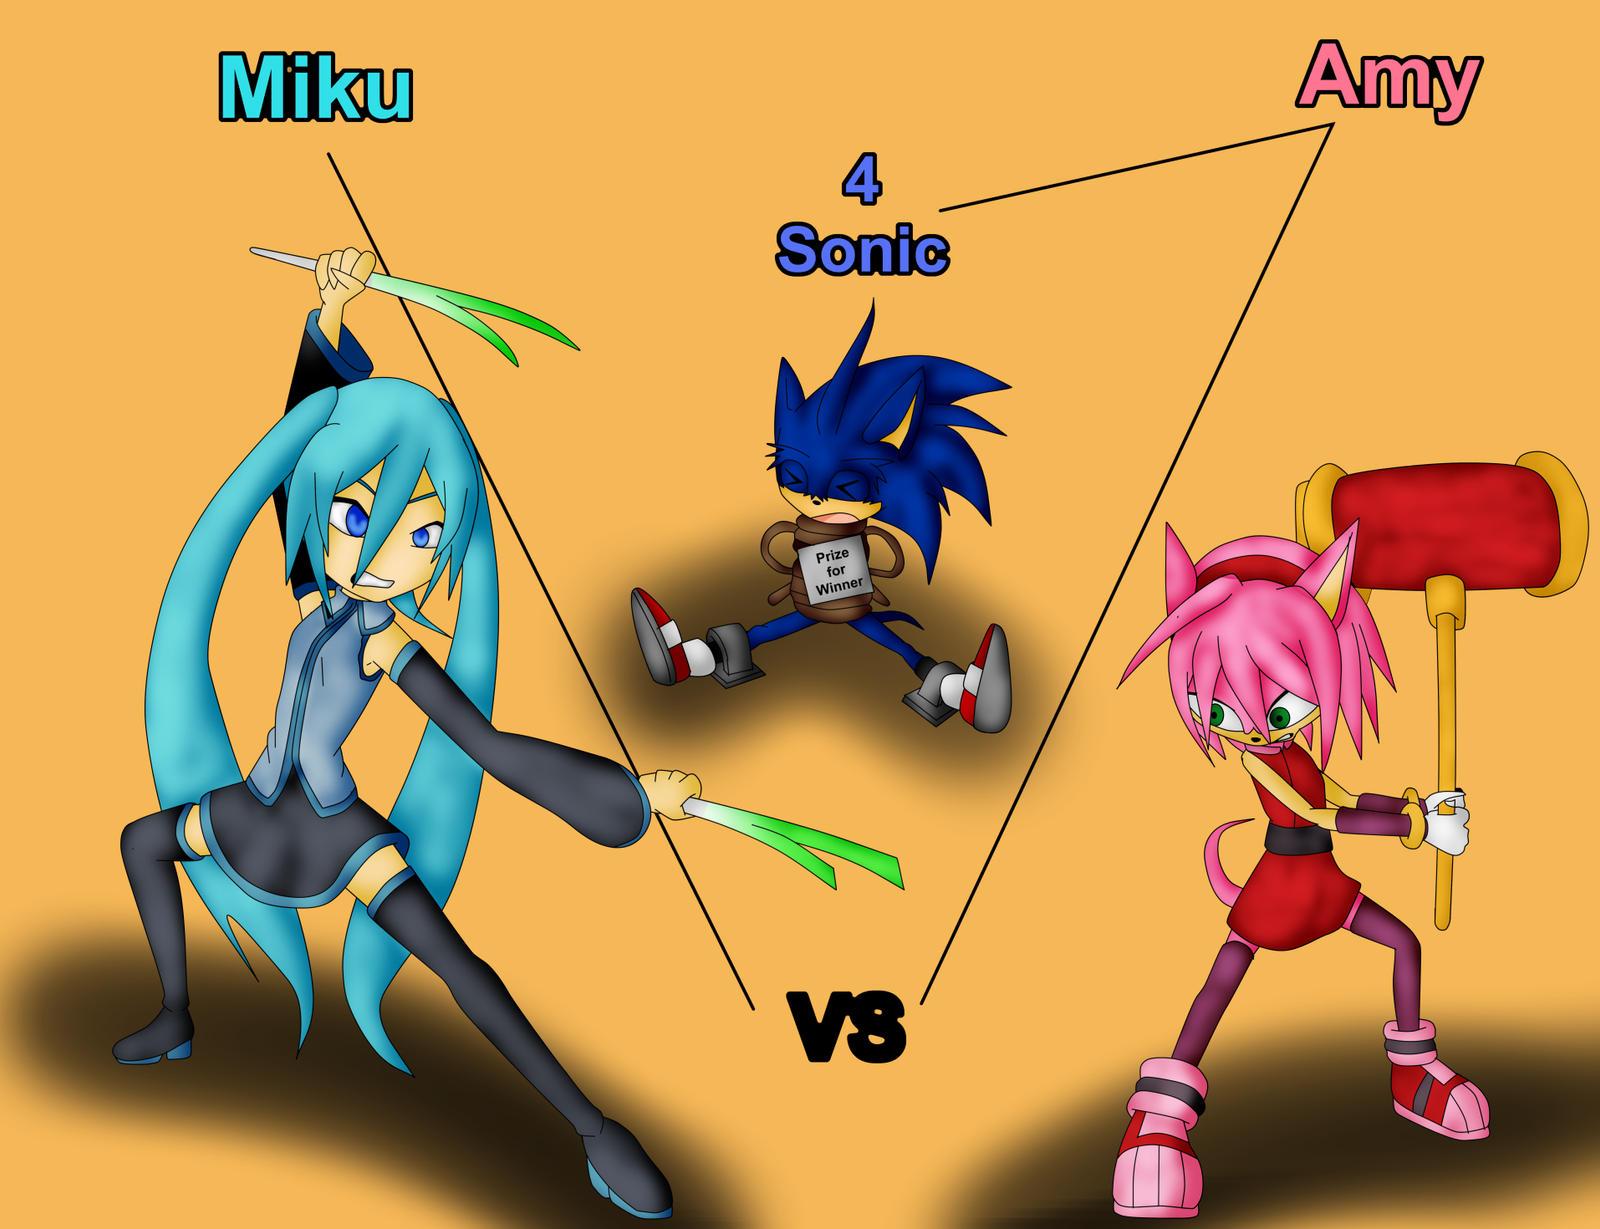 Miku vs Amy for Sonic by Skye-Izumi